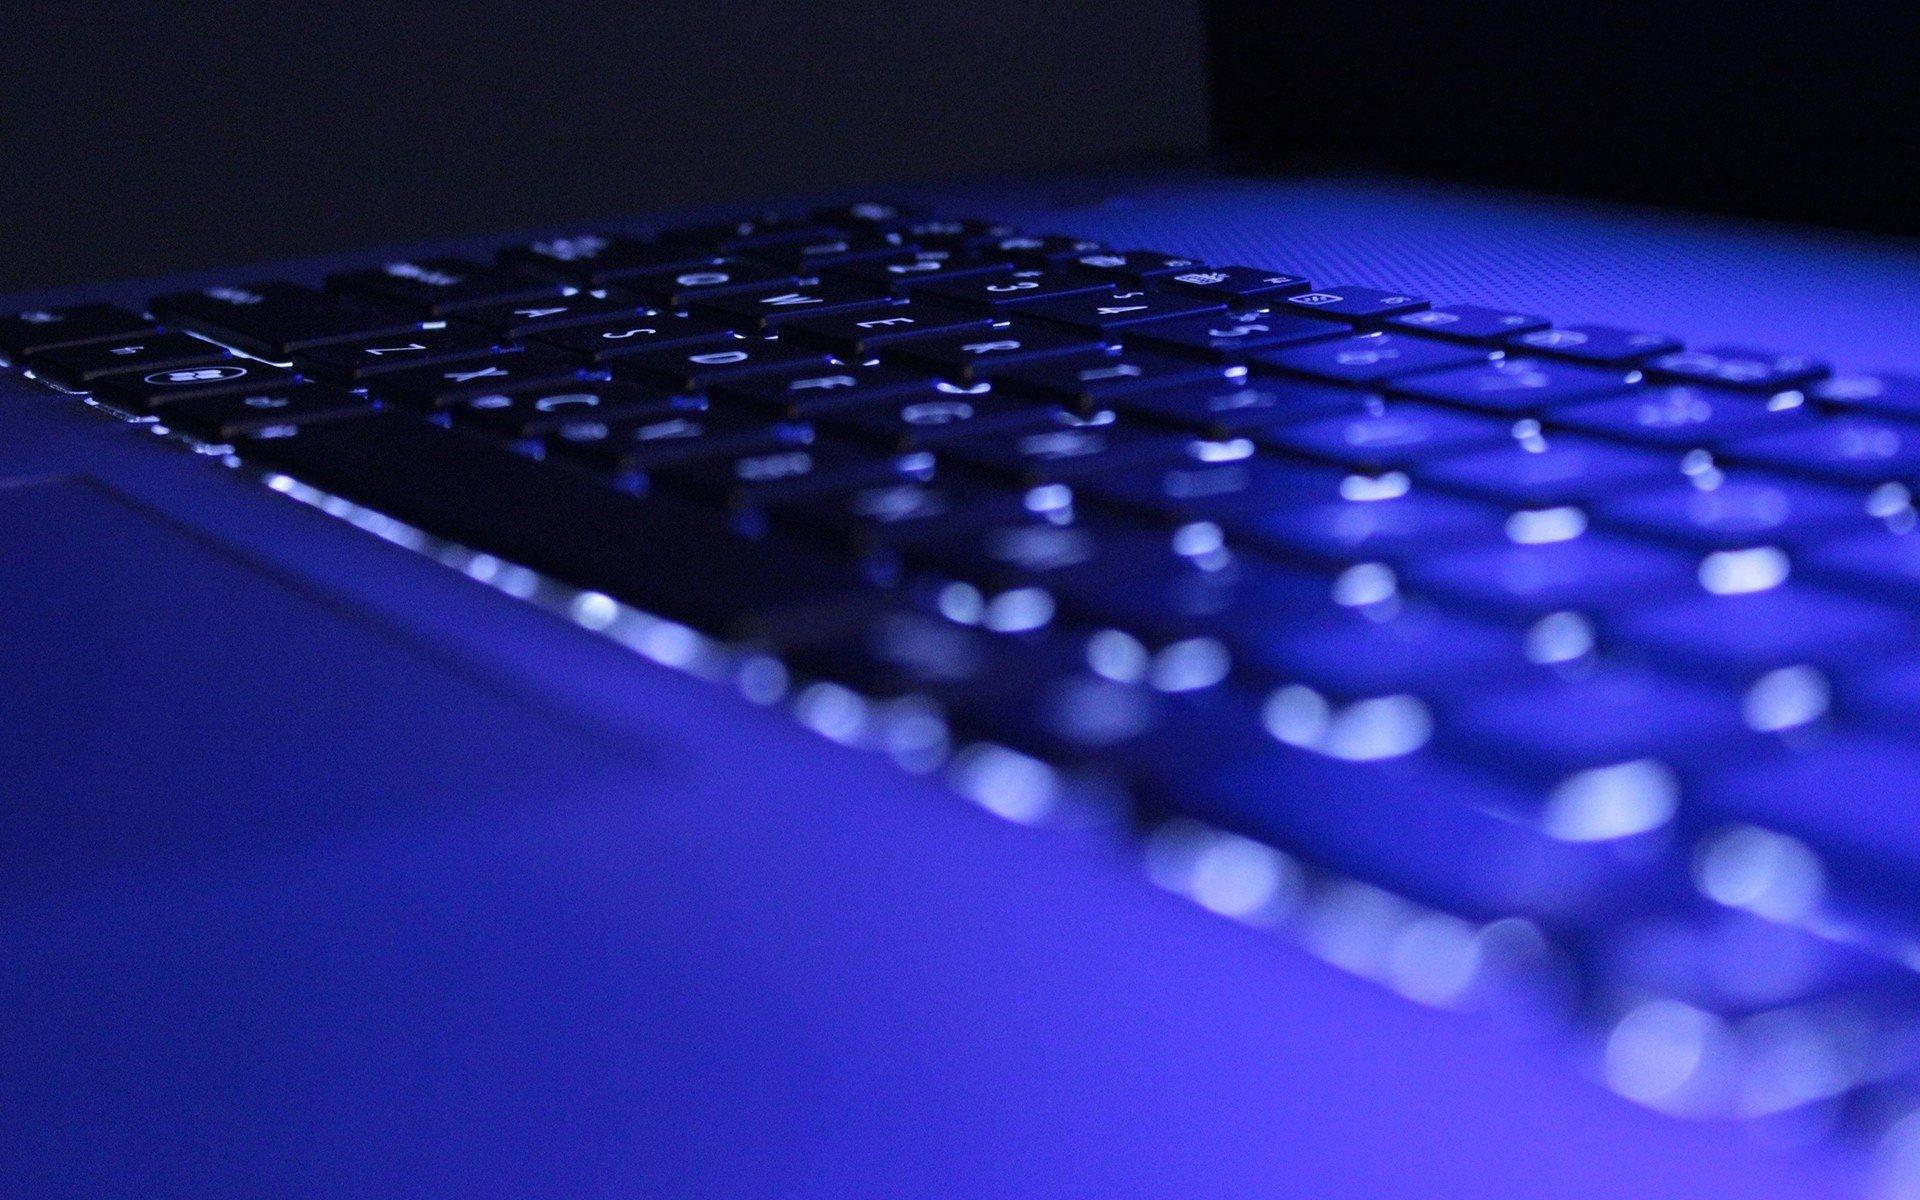 Keyboard HD Wallpaper   Background Image   20x20